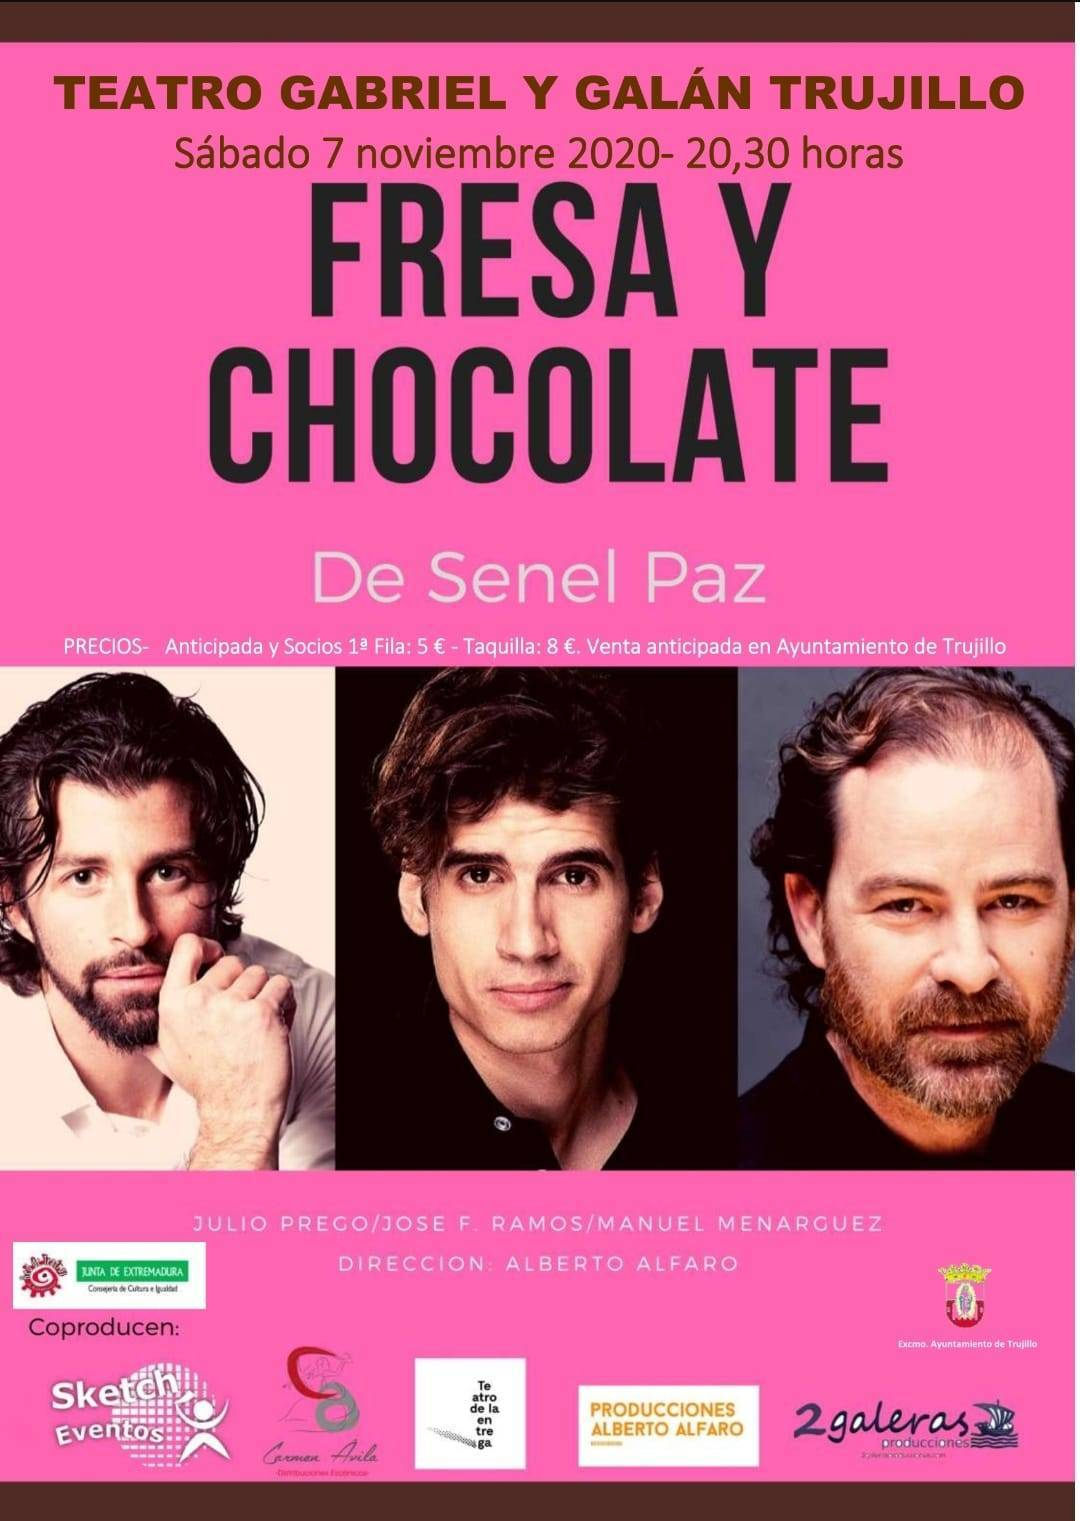 Fresa y chocolate (2020) - Trujillo (Cáceres)